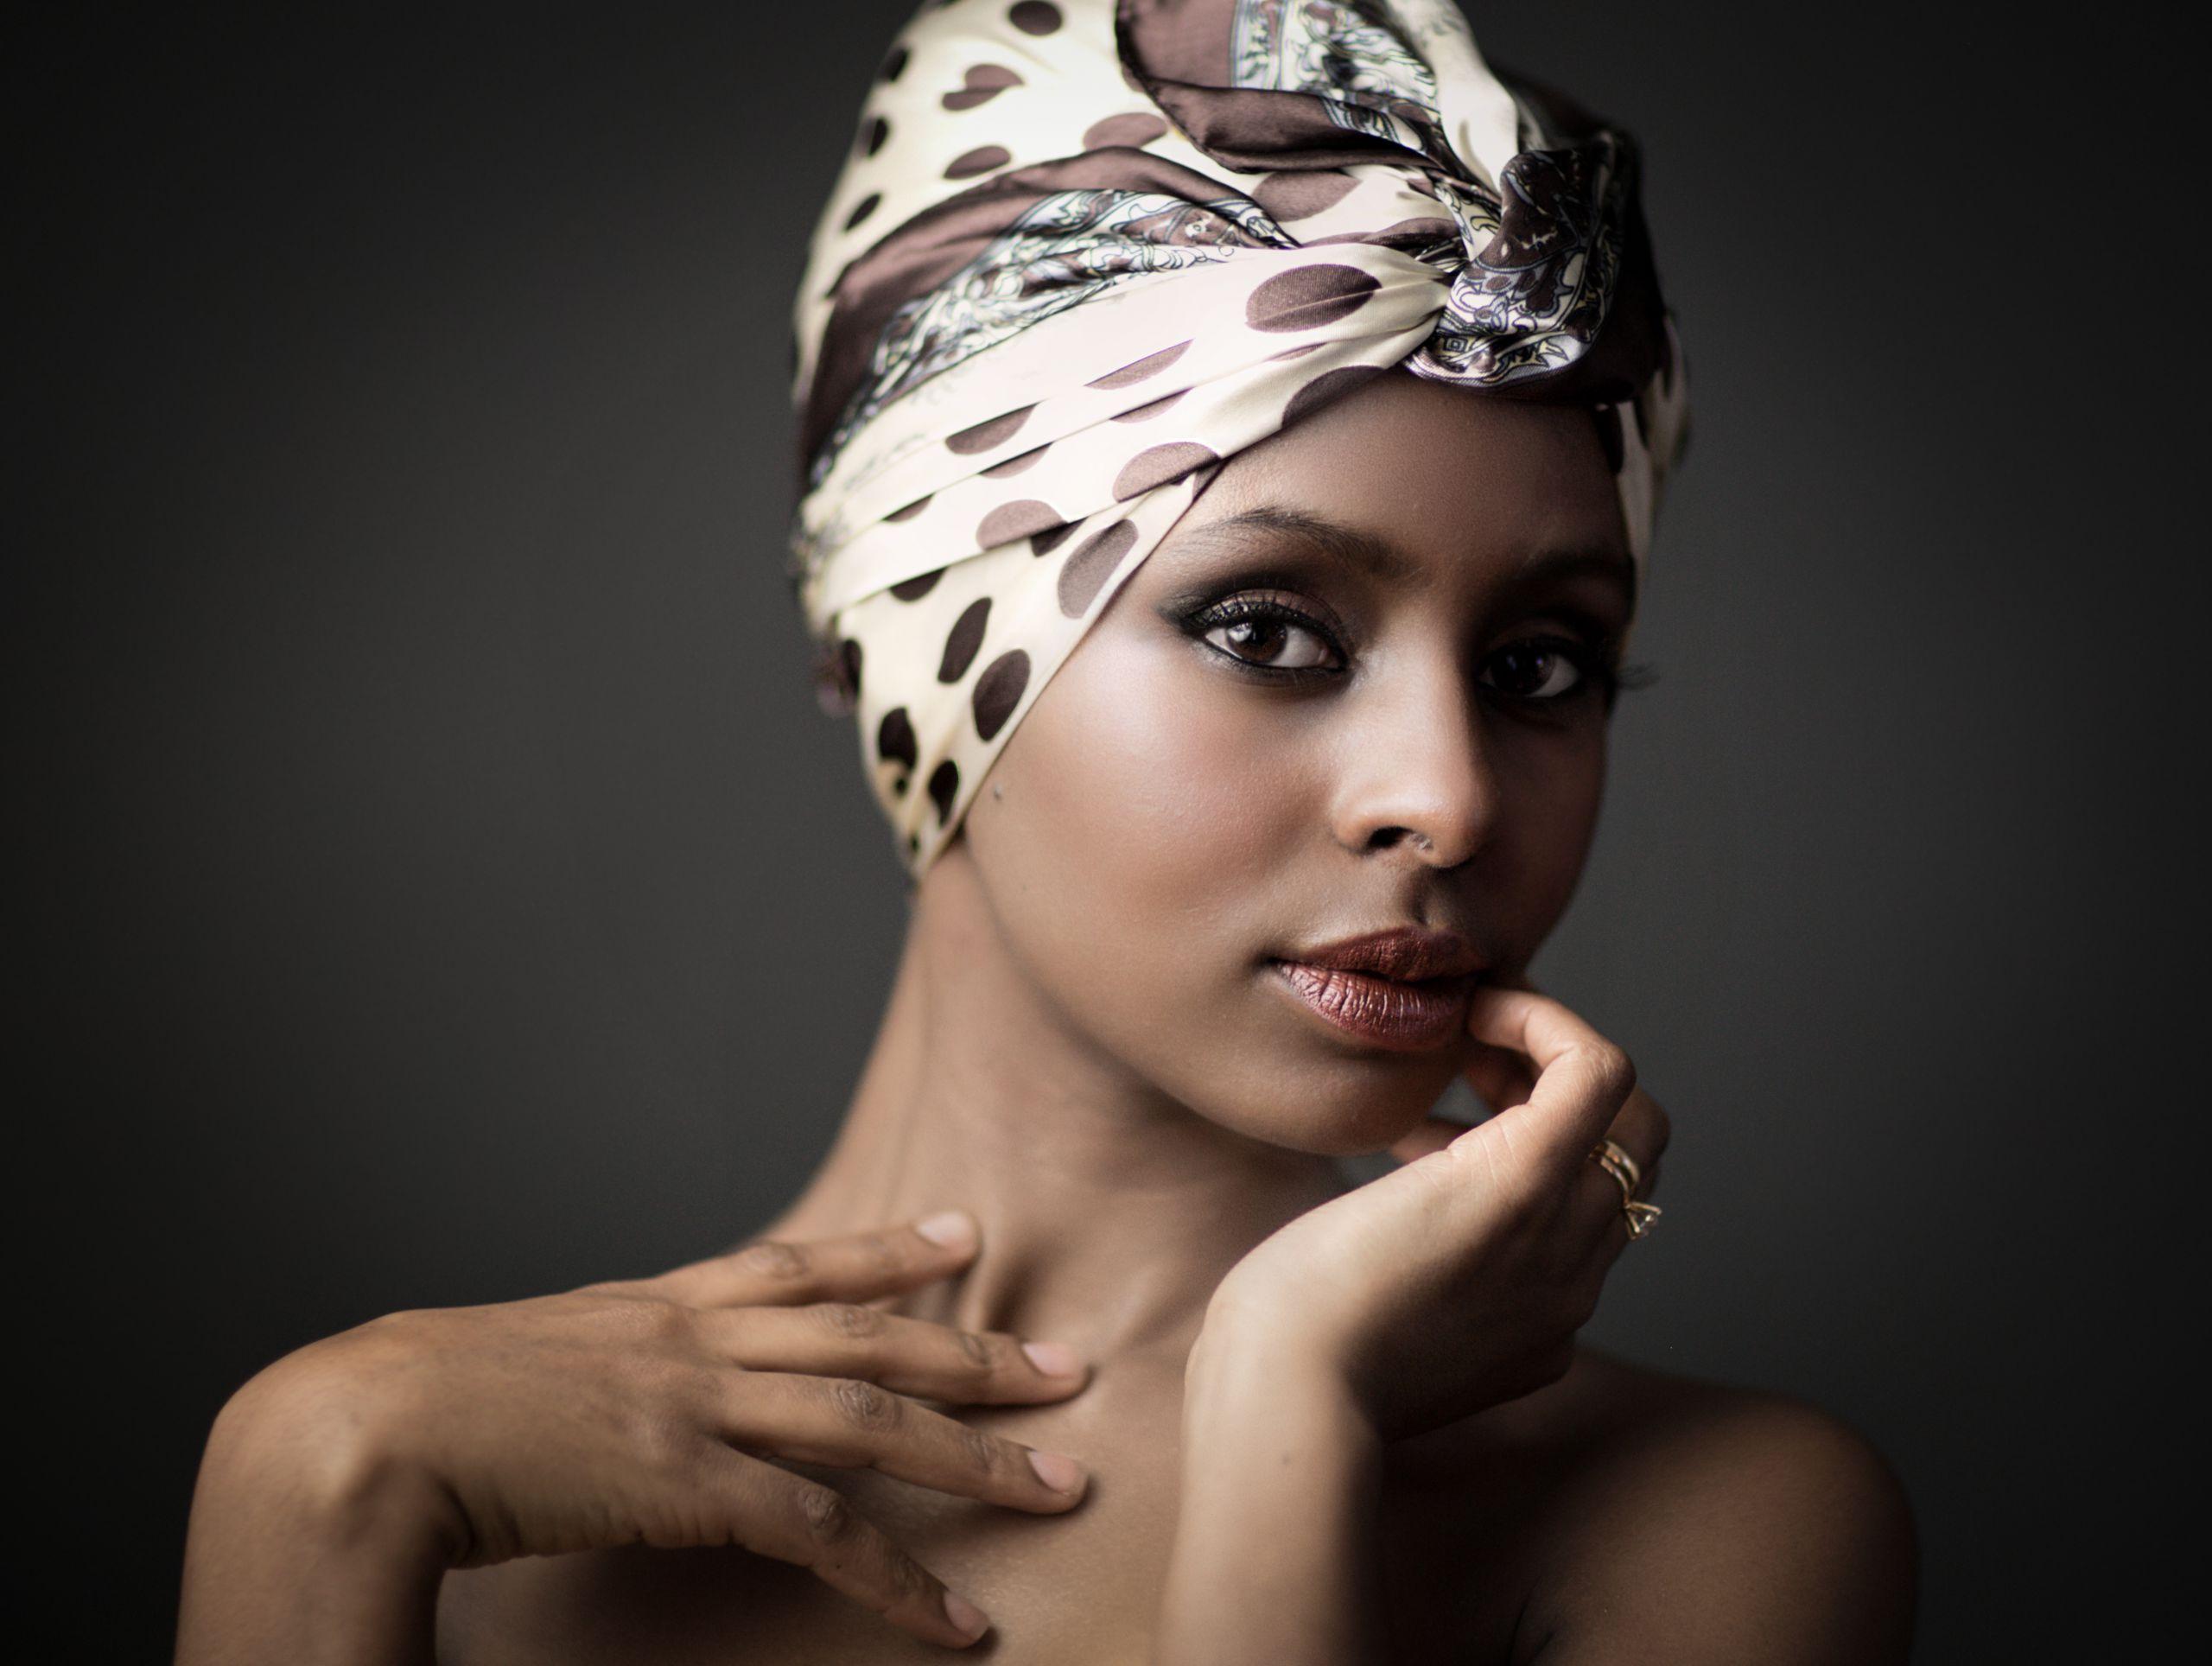 Gorgeous makeup artist look